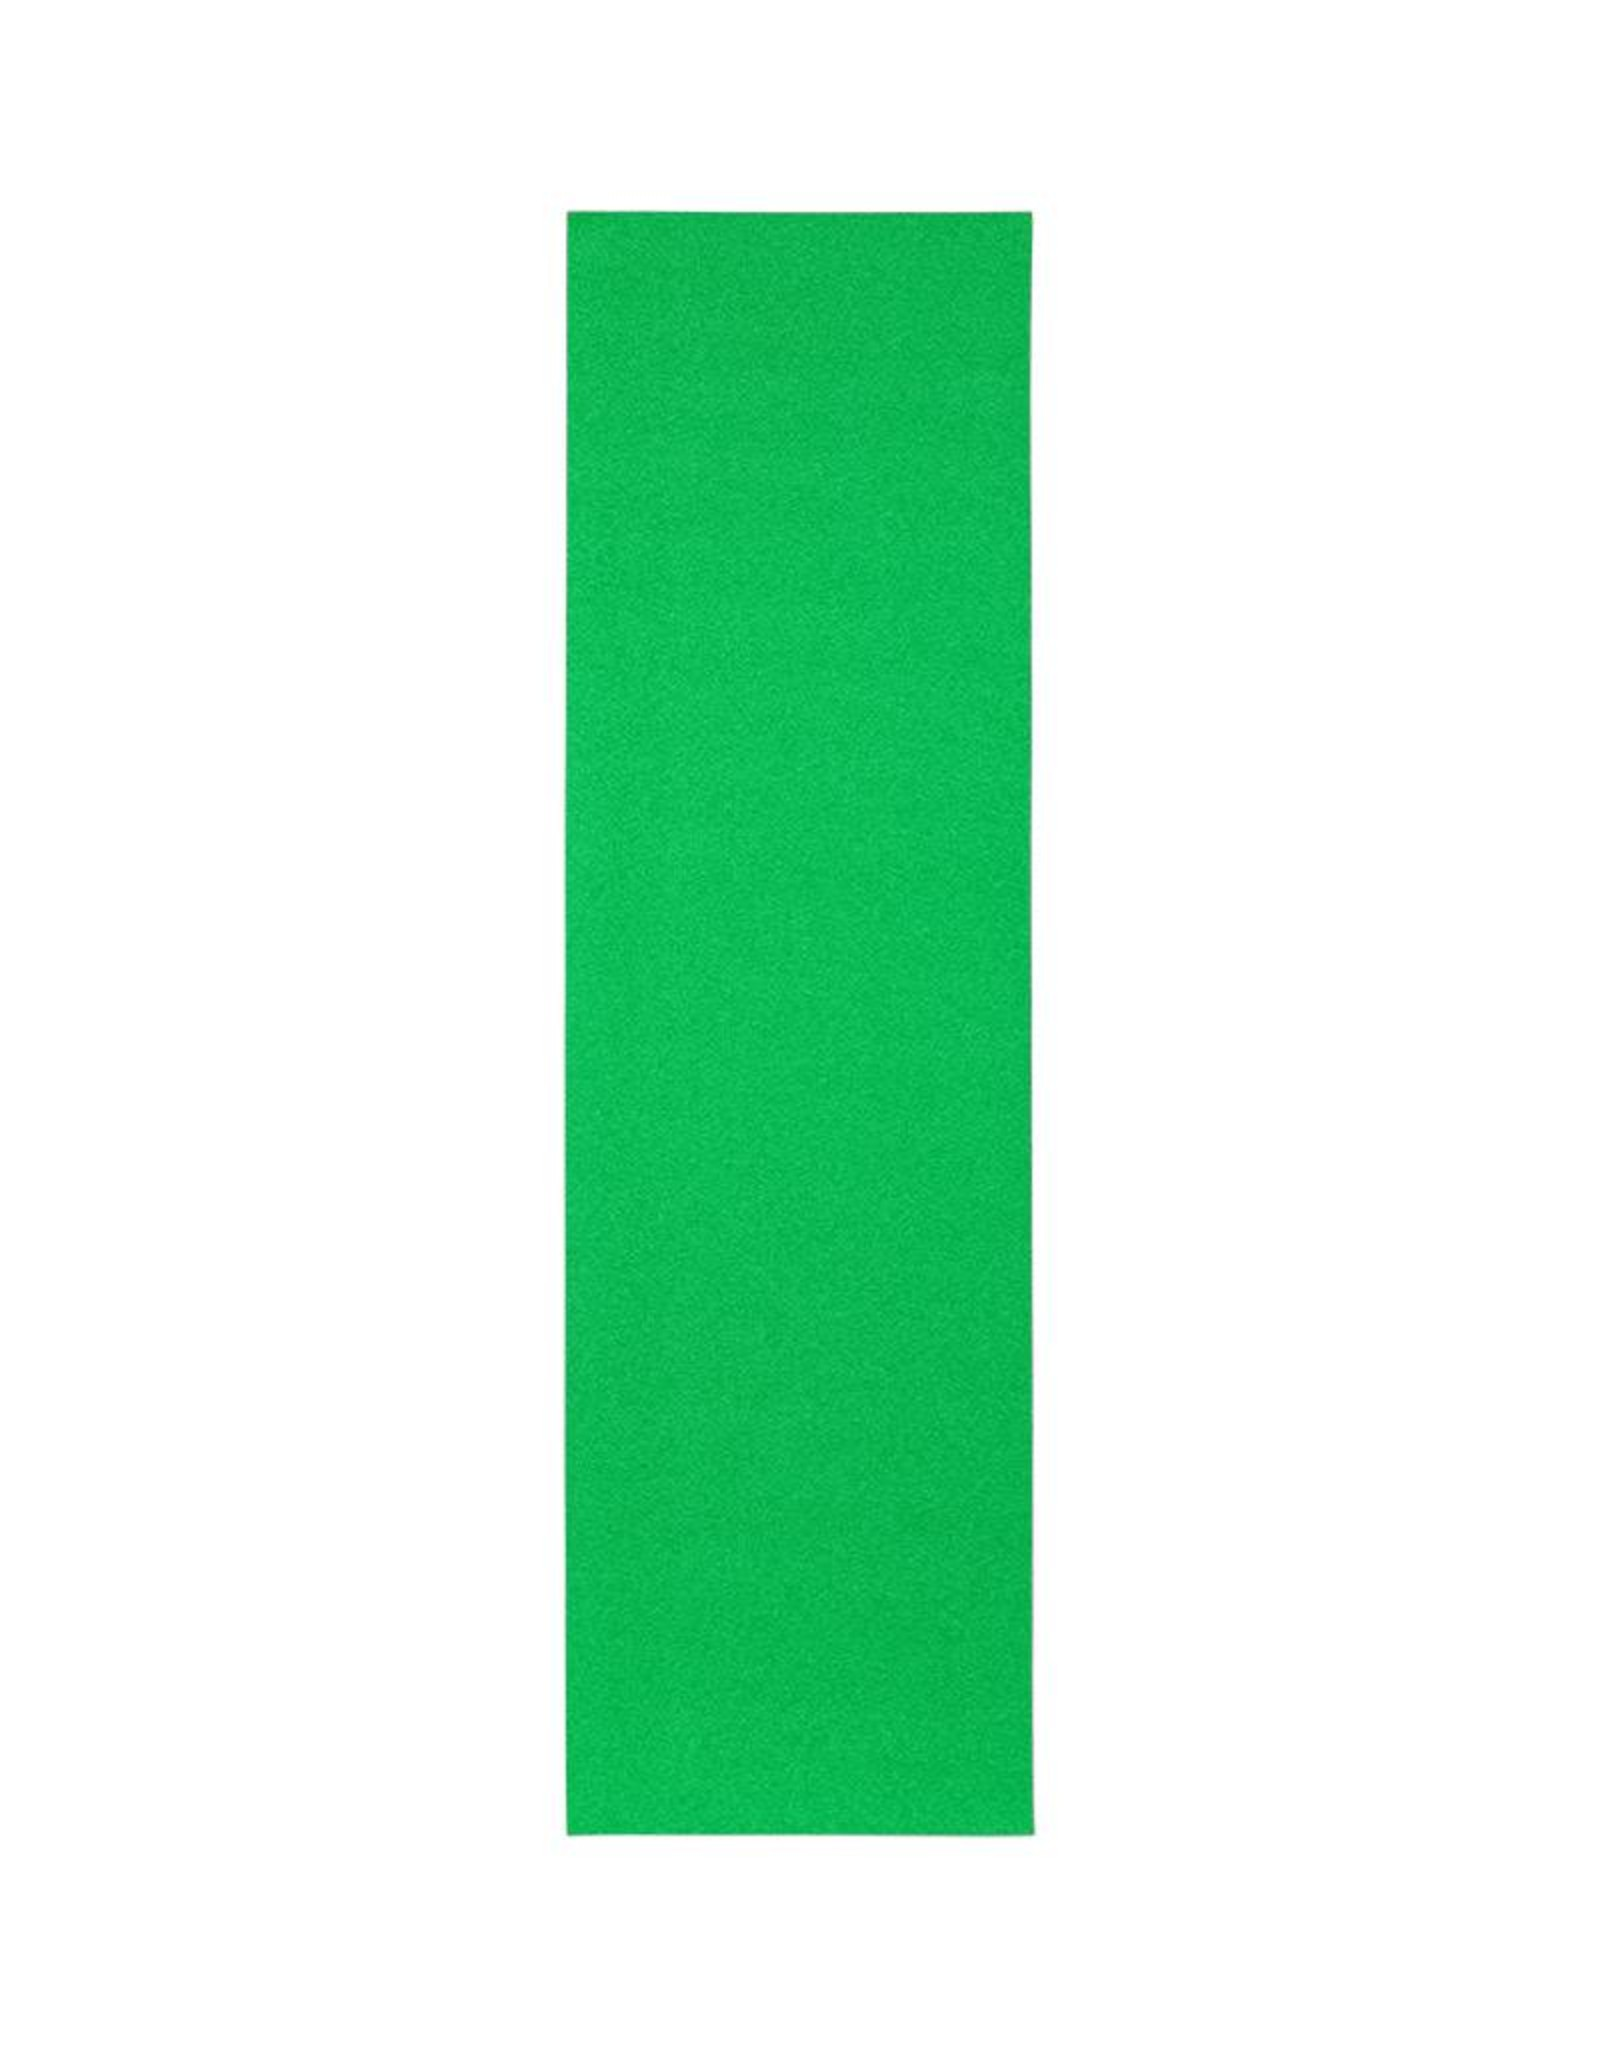 "Vision Street Wear Vision Color Griptape Sheet 9"" x 33"" Green"